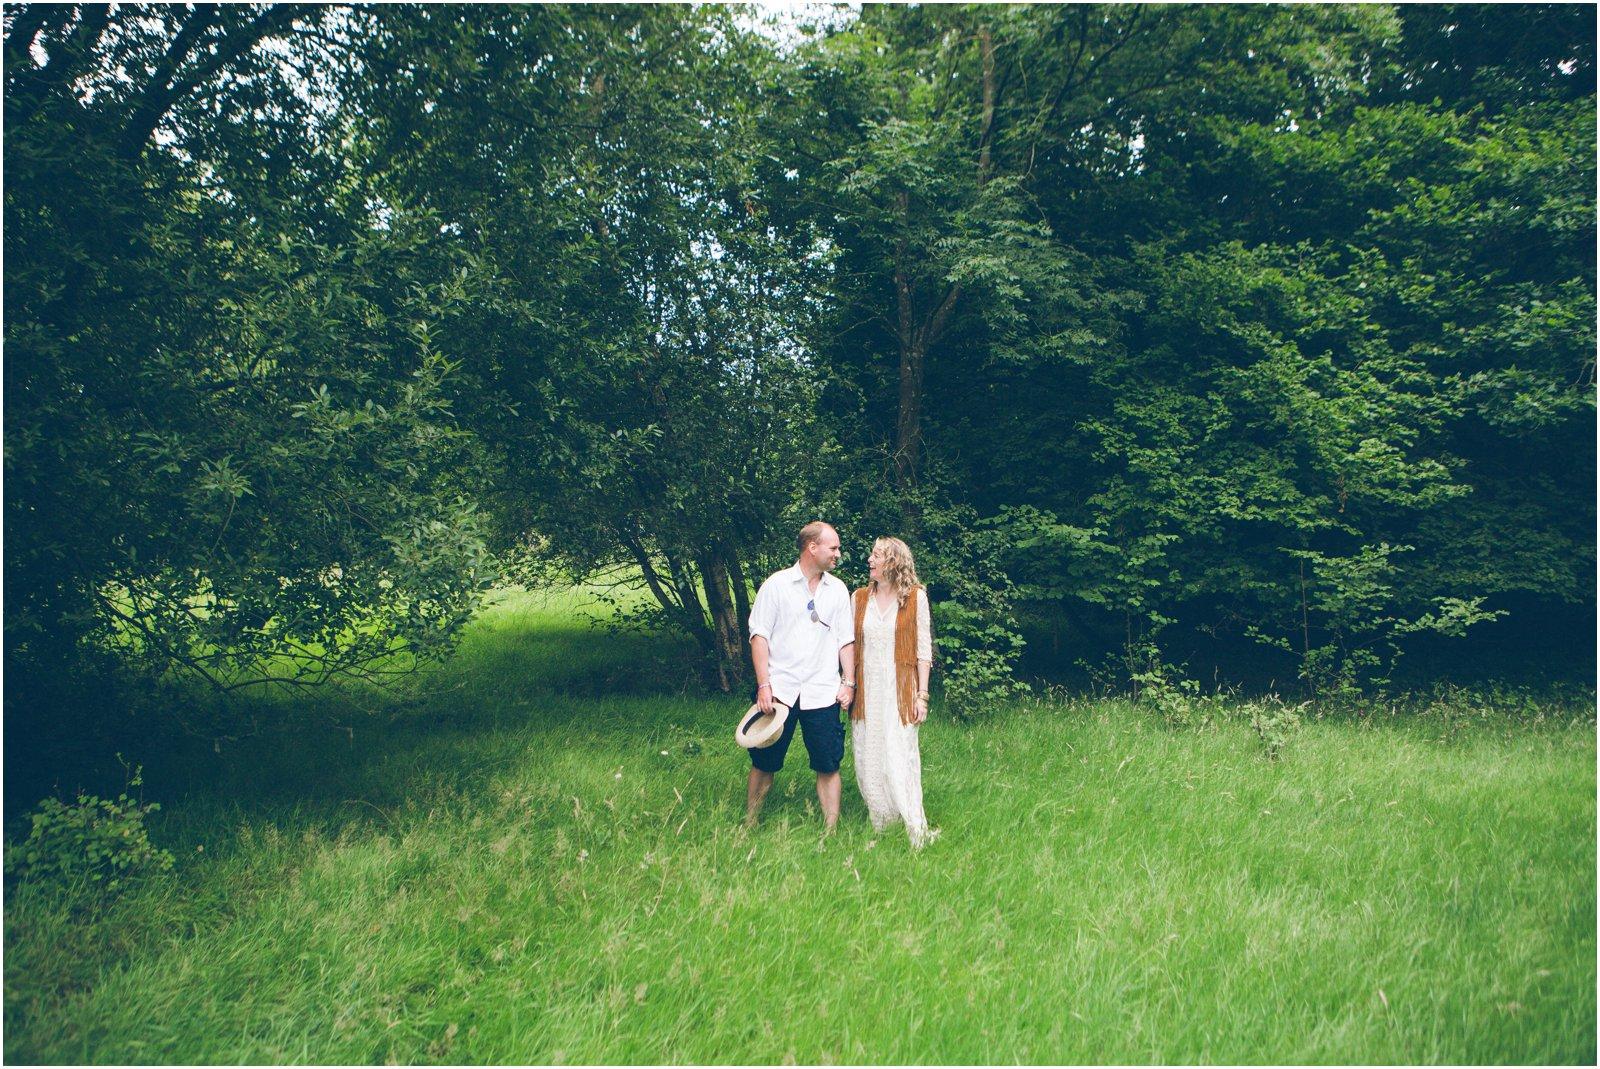 Sally and Damien's wedding festival by Summertown Pictures-76_DerrynSchmidt